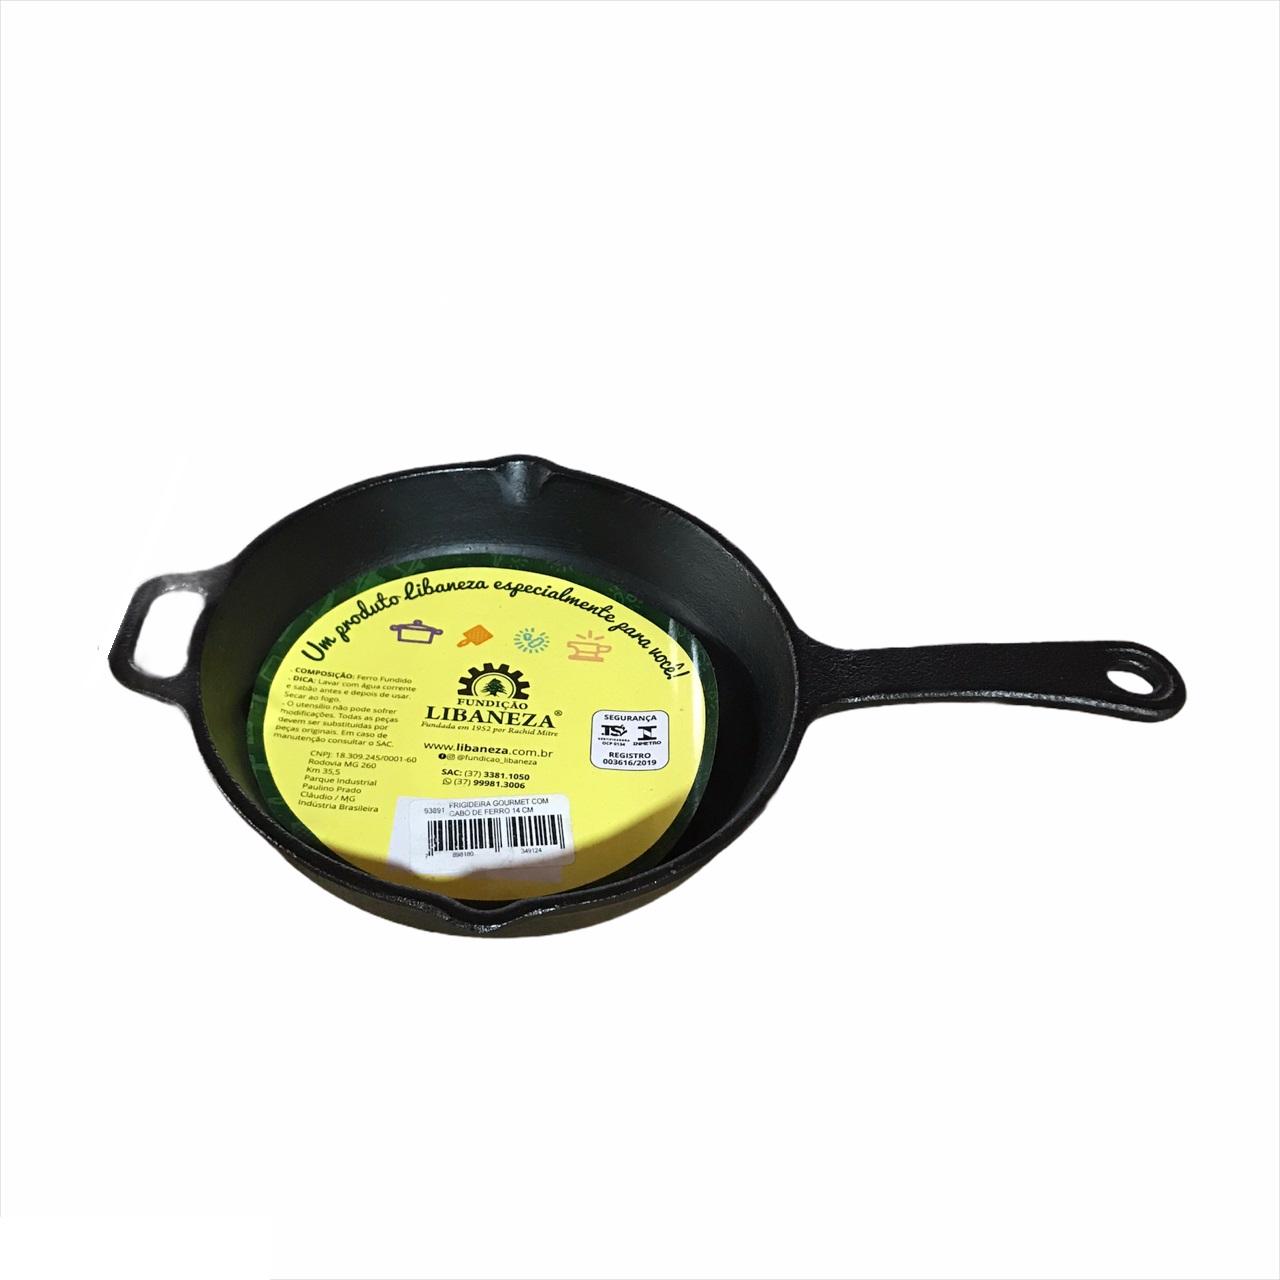 Frigideira Gourmet Ferro Fundido 0,3 Litro Cabo de Ferro 14 cm